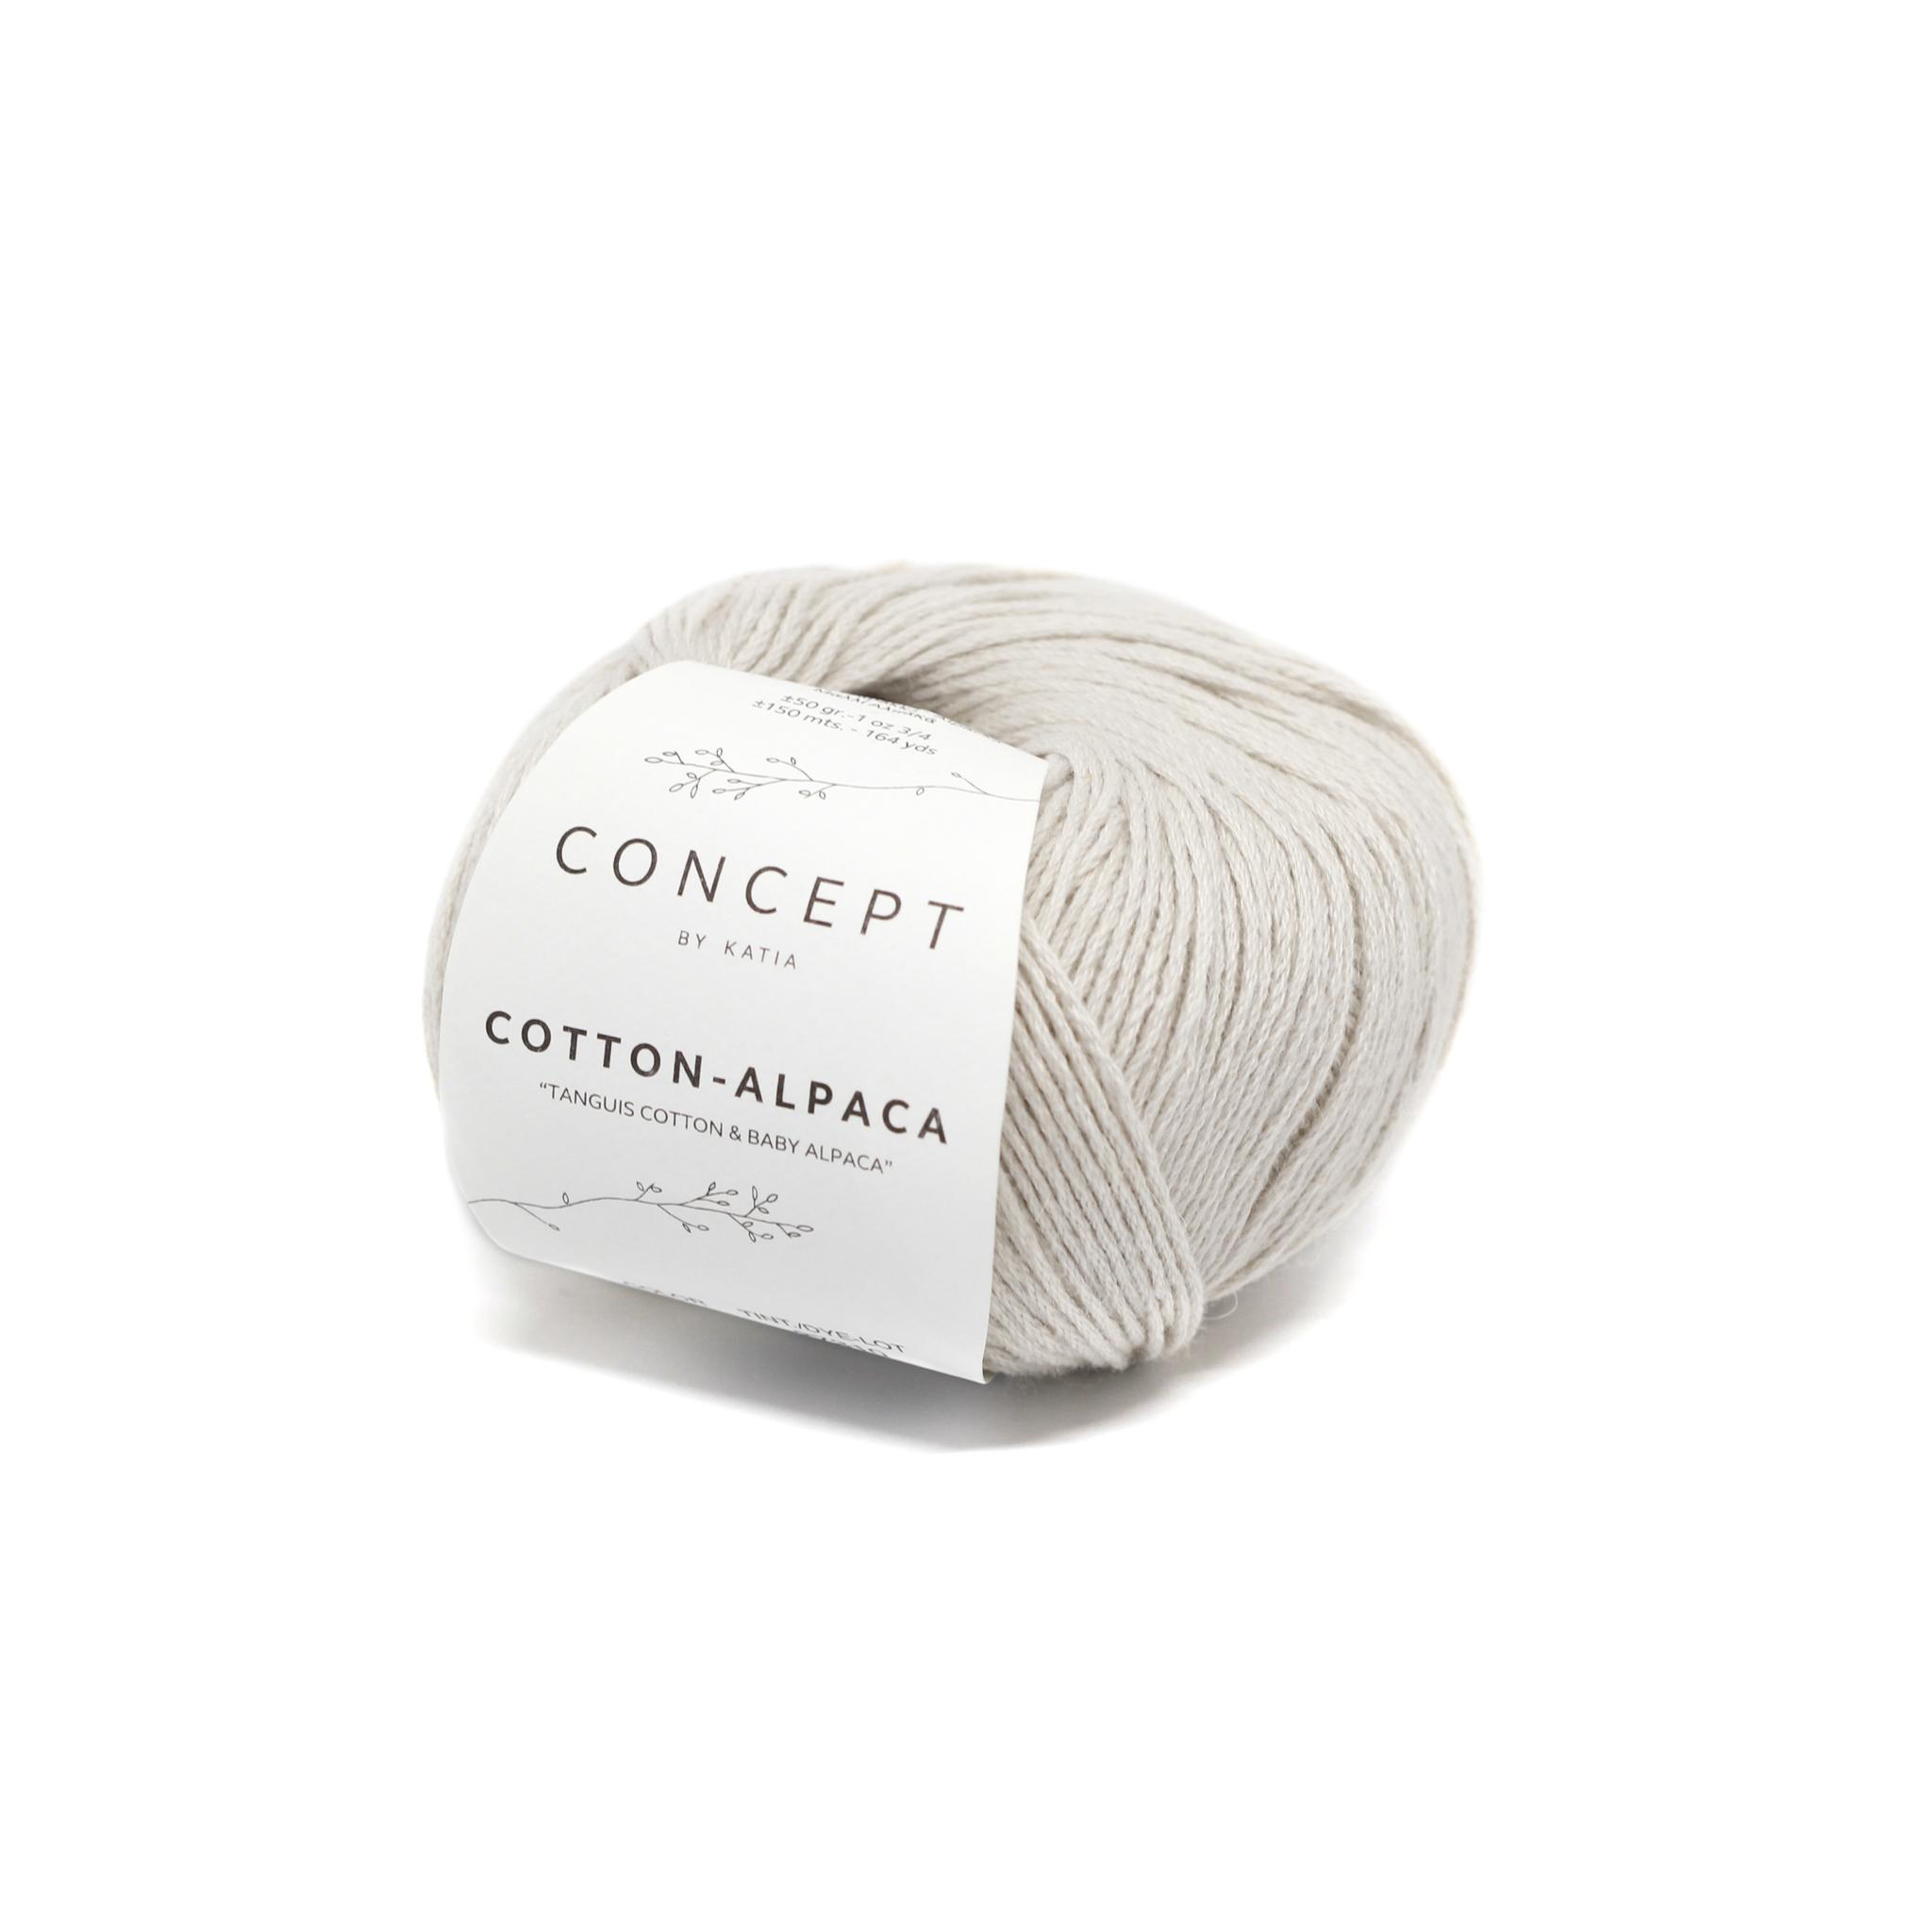 Katia Concept Cotton-Alpaca - 82